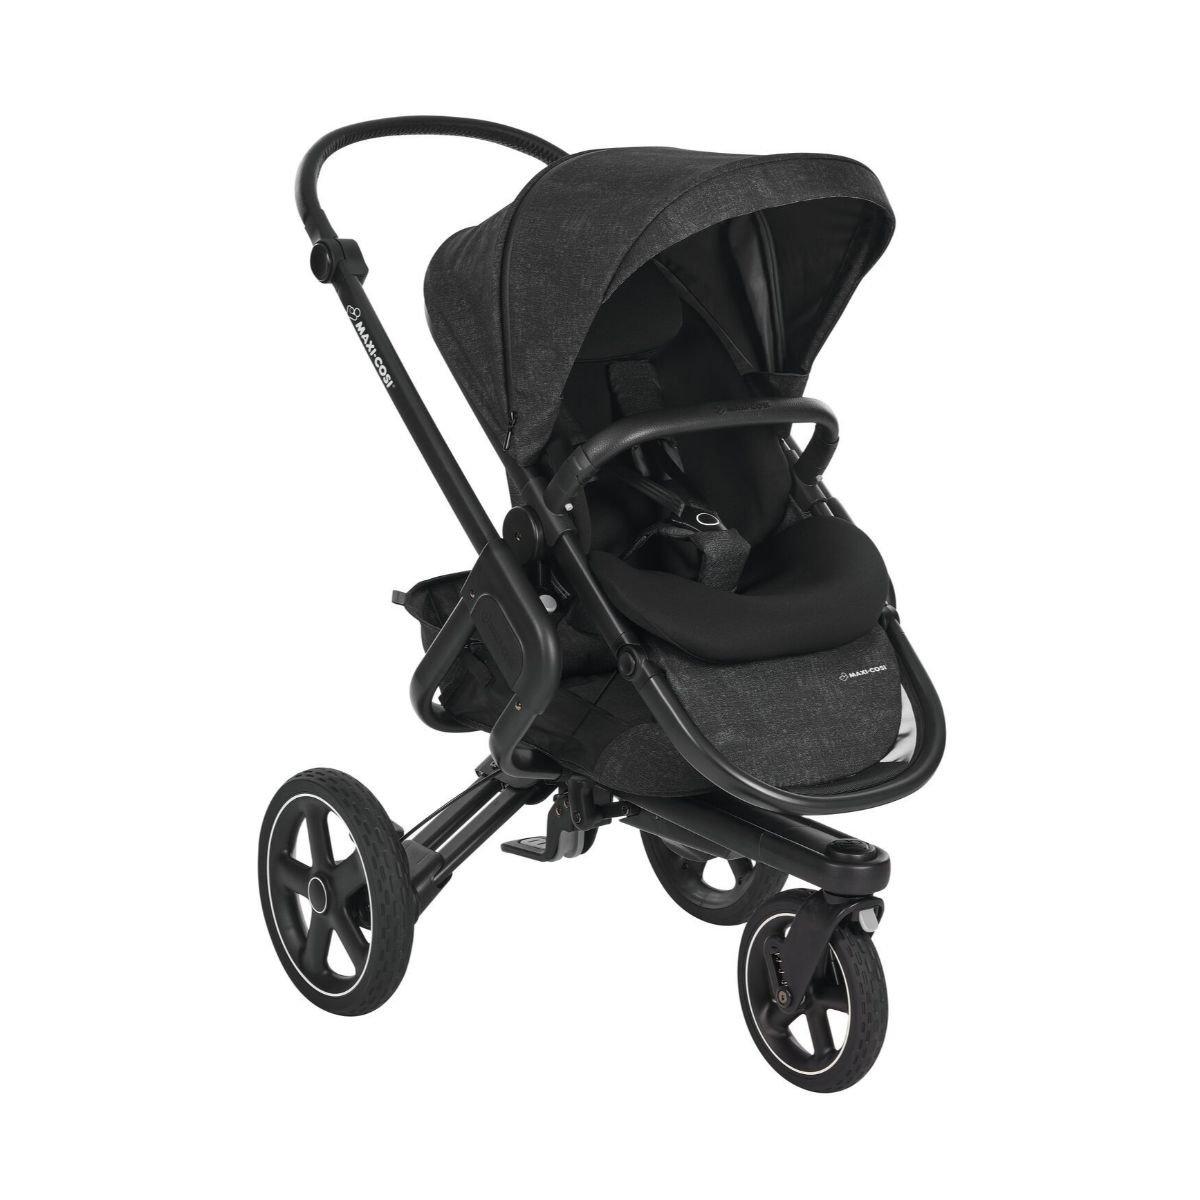 Carucior Sport Maxi-Cosi Nova 3 Nomad, Black